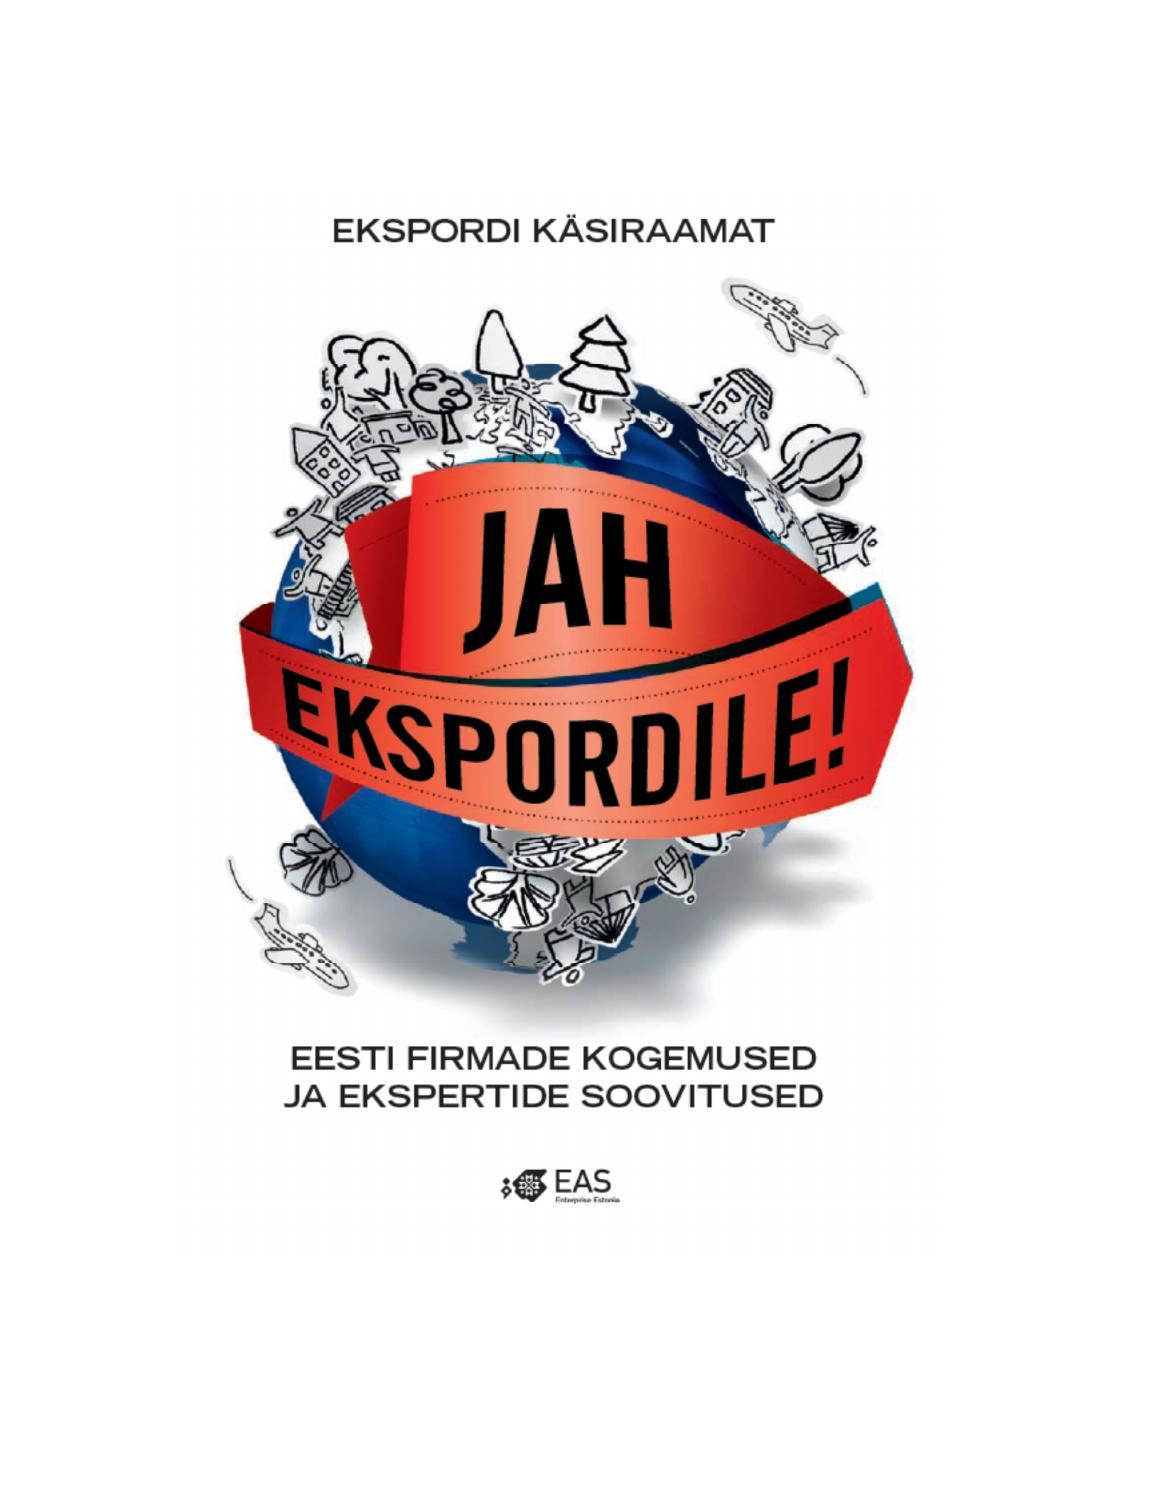 ekspordi k228siraamat �jah ekspordile� by eas enterprise